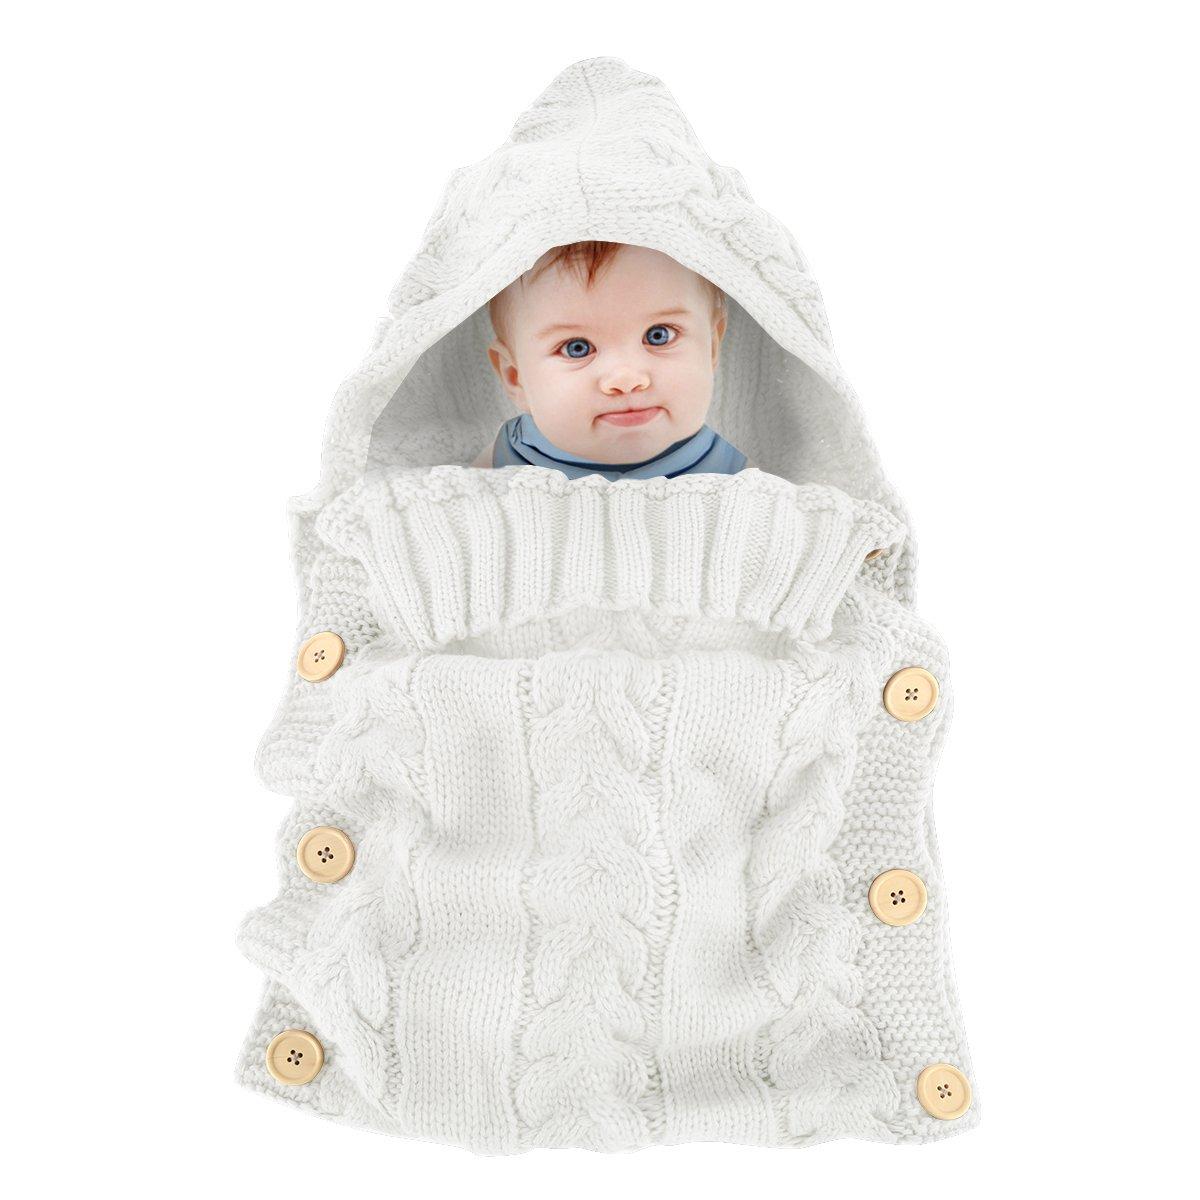 Colorful Newborn Baby Wrap Swaddle Blanket, Oenbopo Baby Kids Toddler Knit Blanket Swaddle Sleeping Bag Sack Sleep Bag Stroller Wrap for 0-12 Month Baby (White)